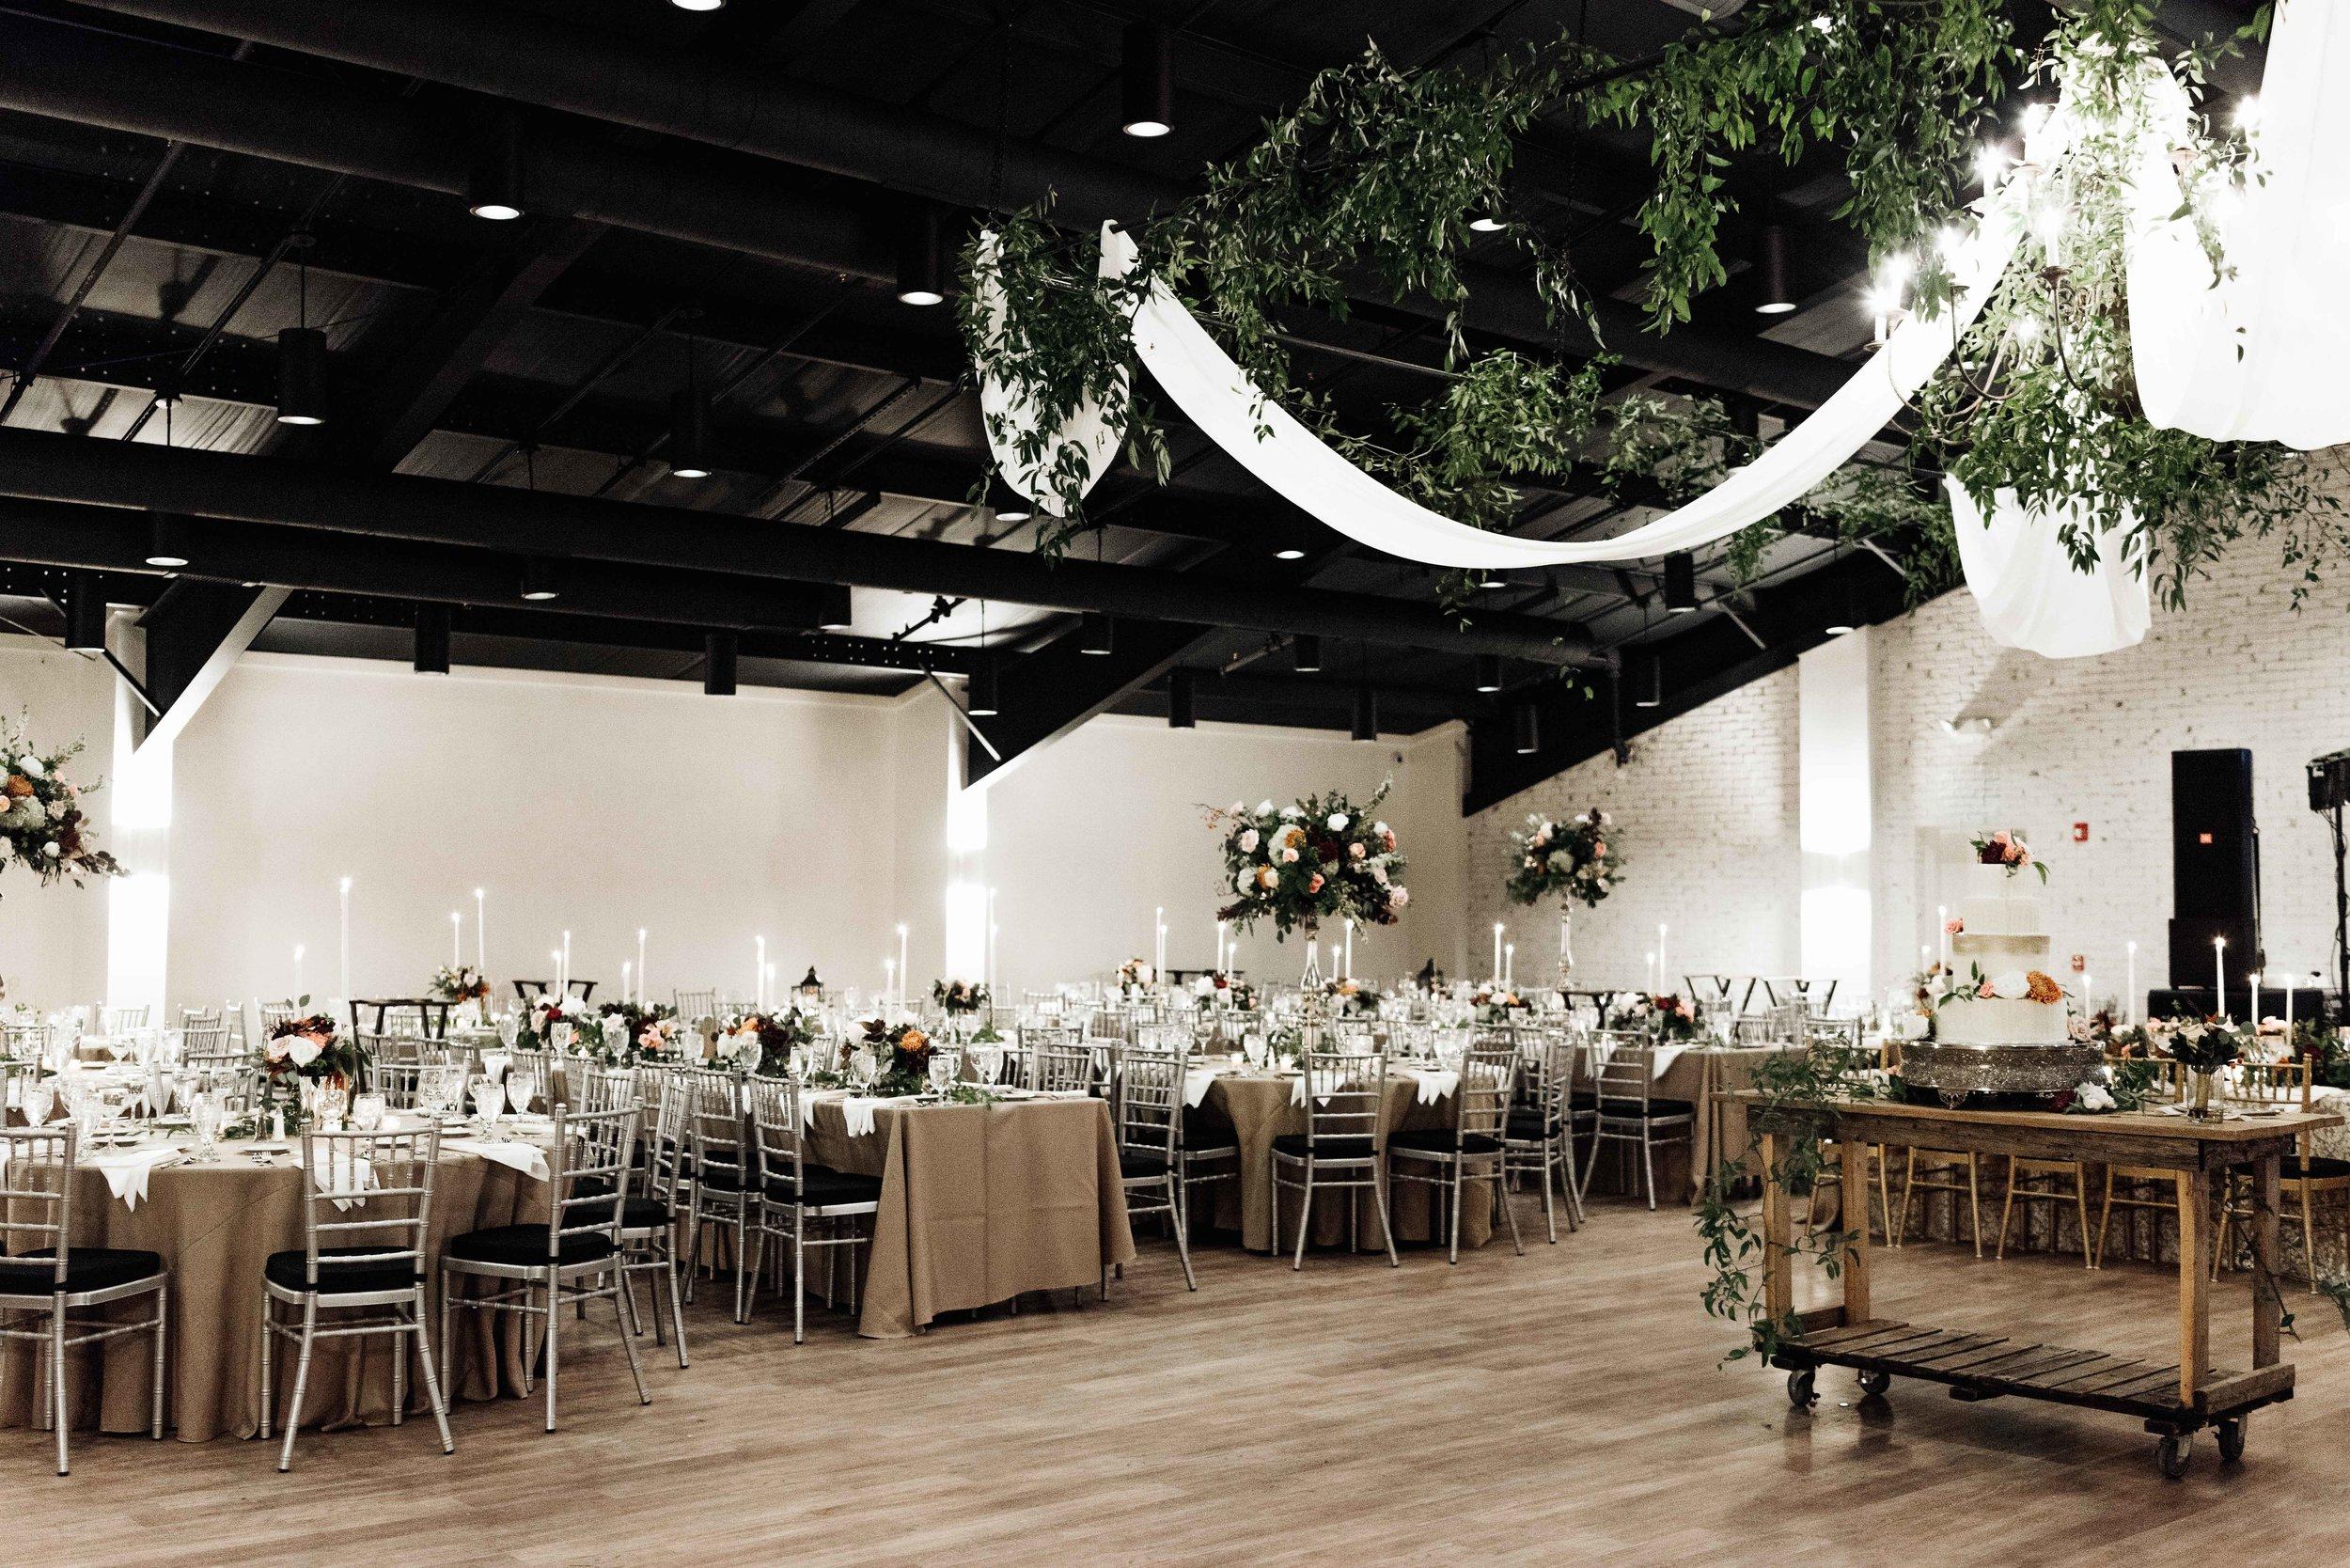 Carlee-Bob-Indianapolis-Wedding-Blog-157.jpg